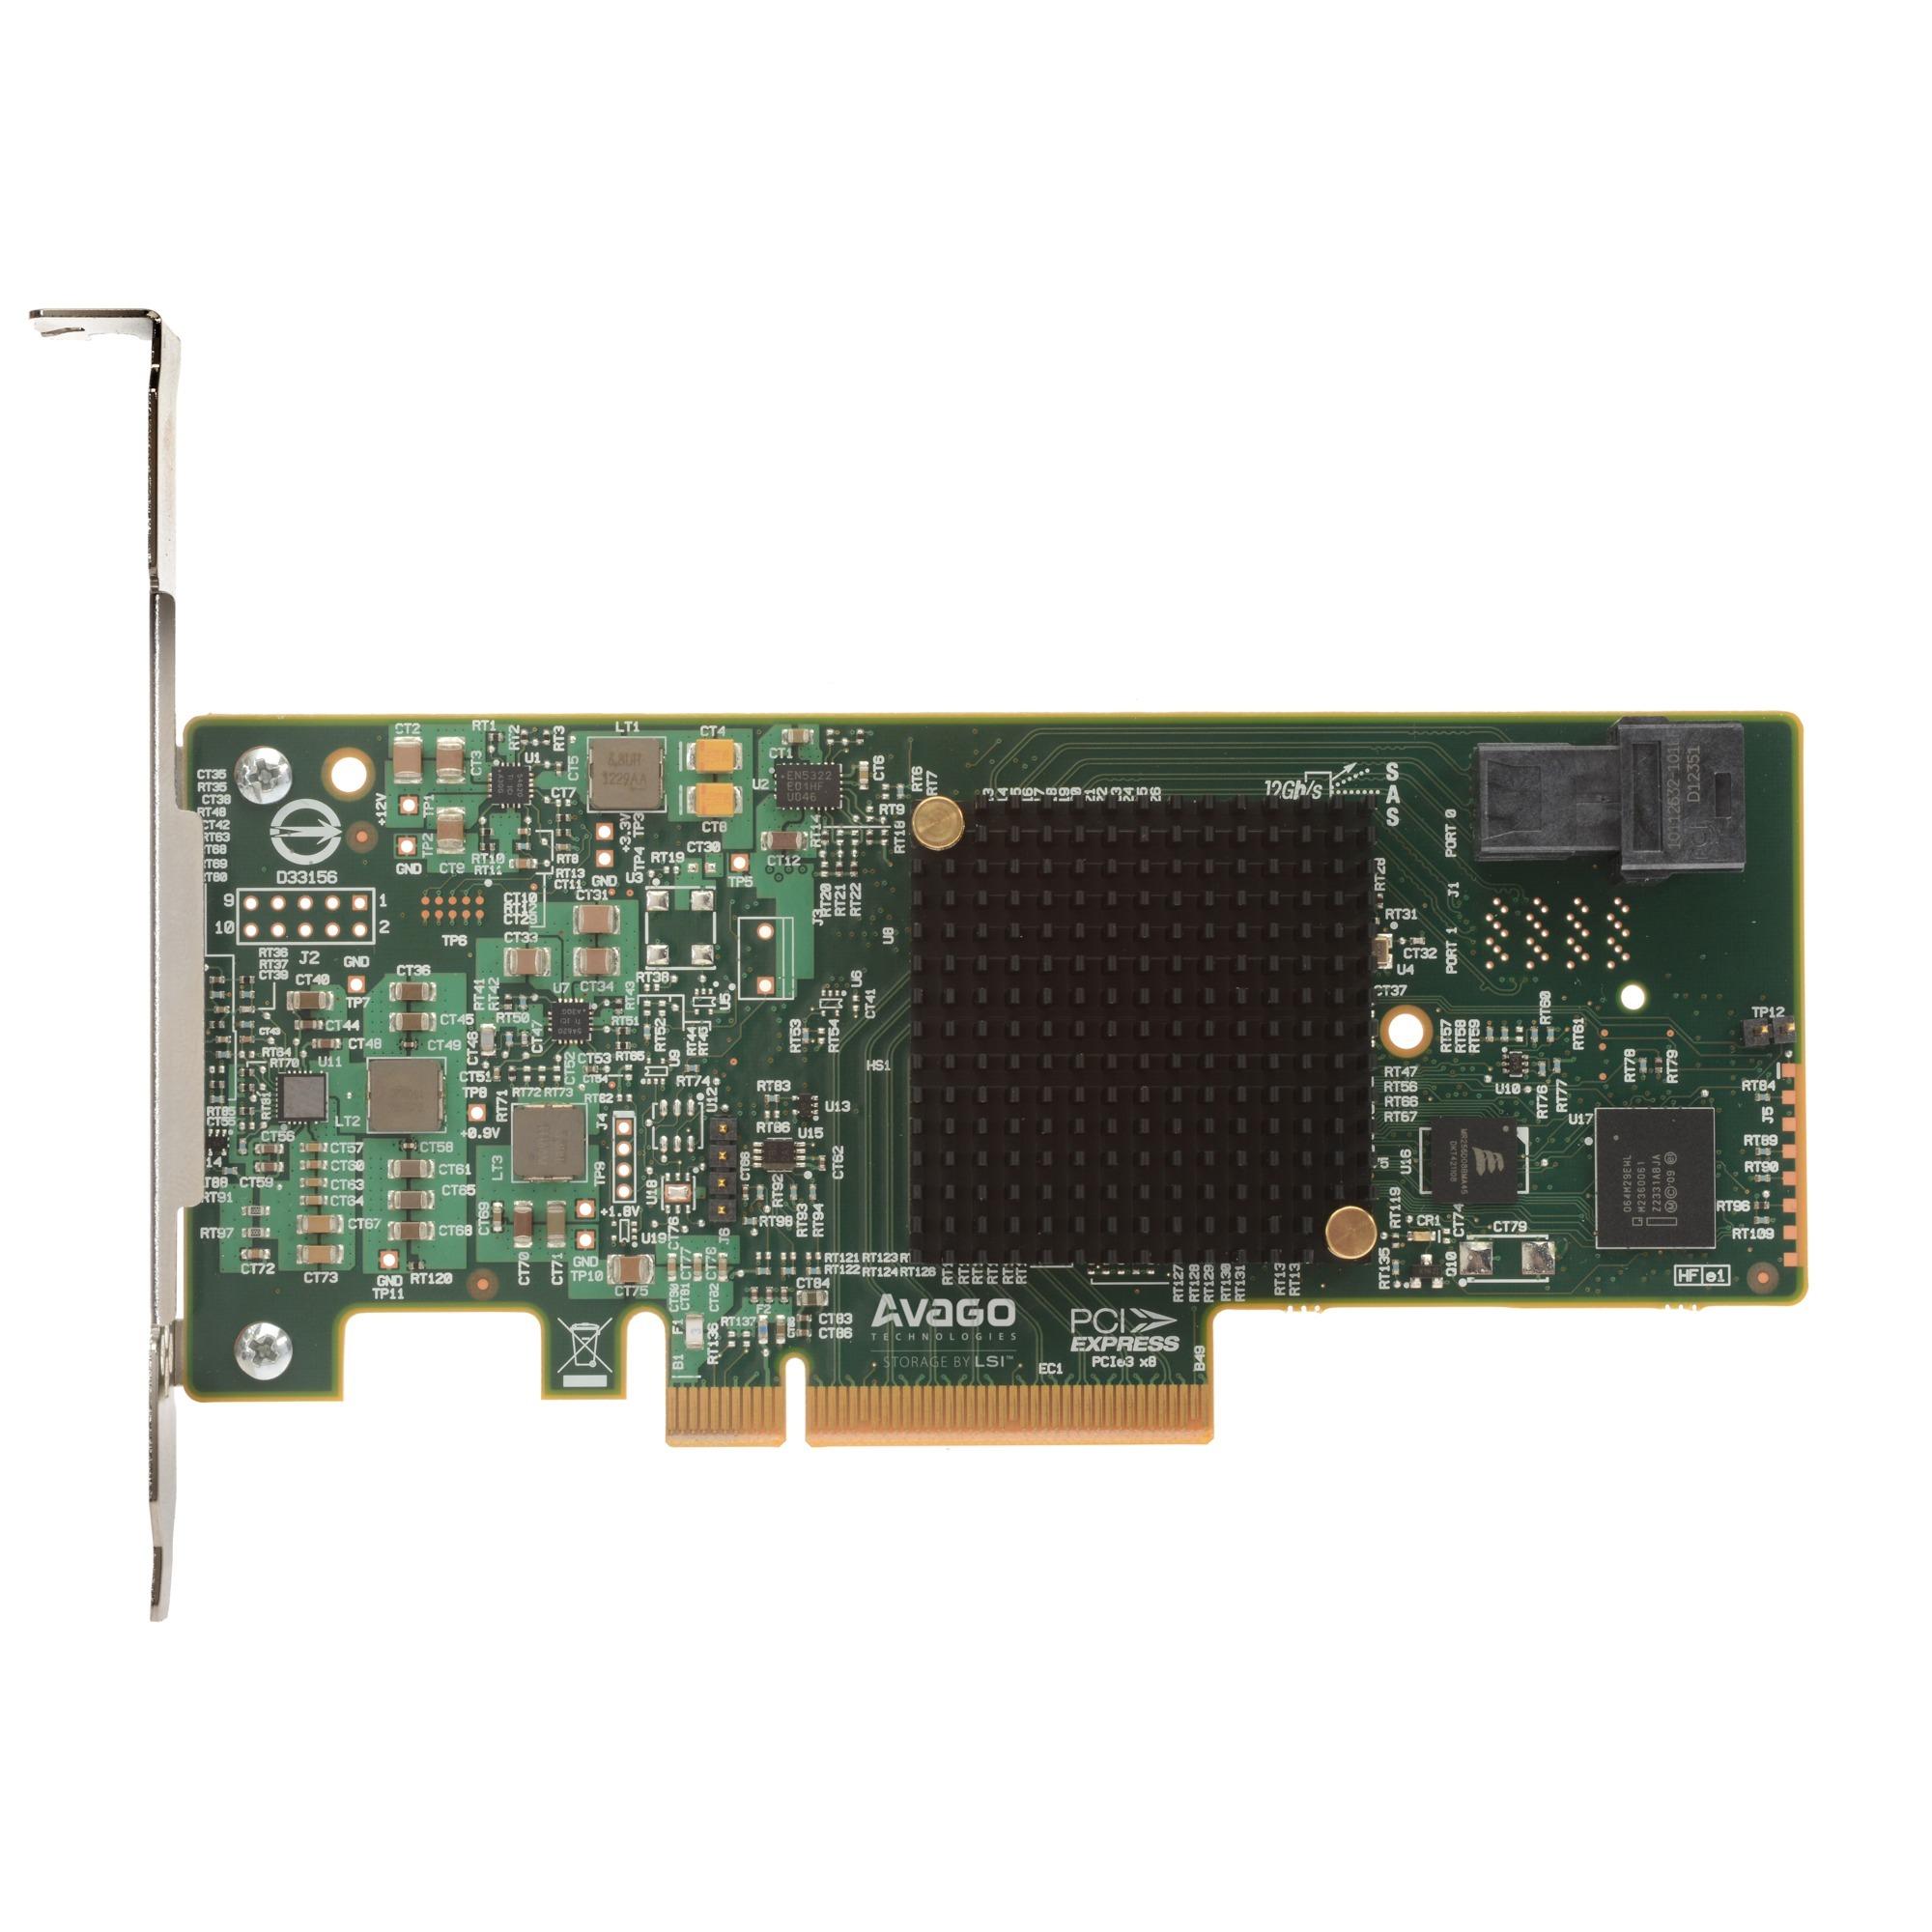 MegaRAID SAS 9341-4i PCI Express x8 3.0 12Gbit/s controlado RAID, Controlador